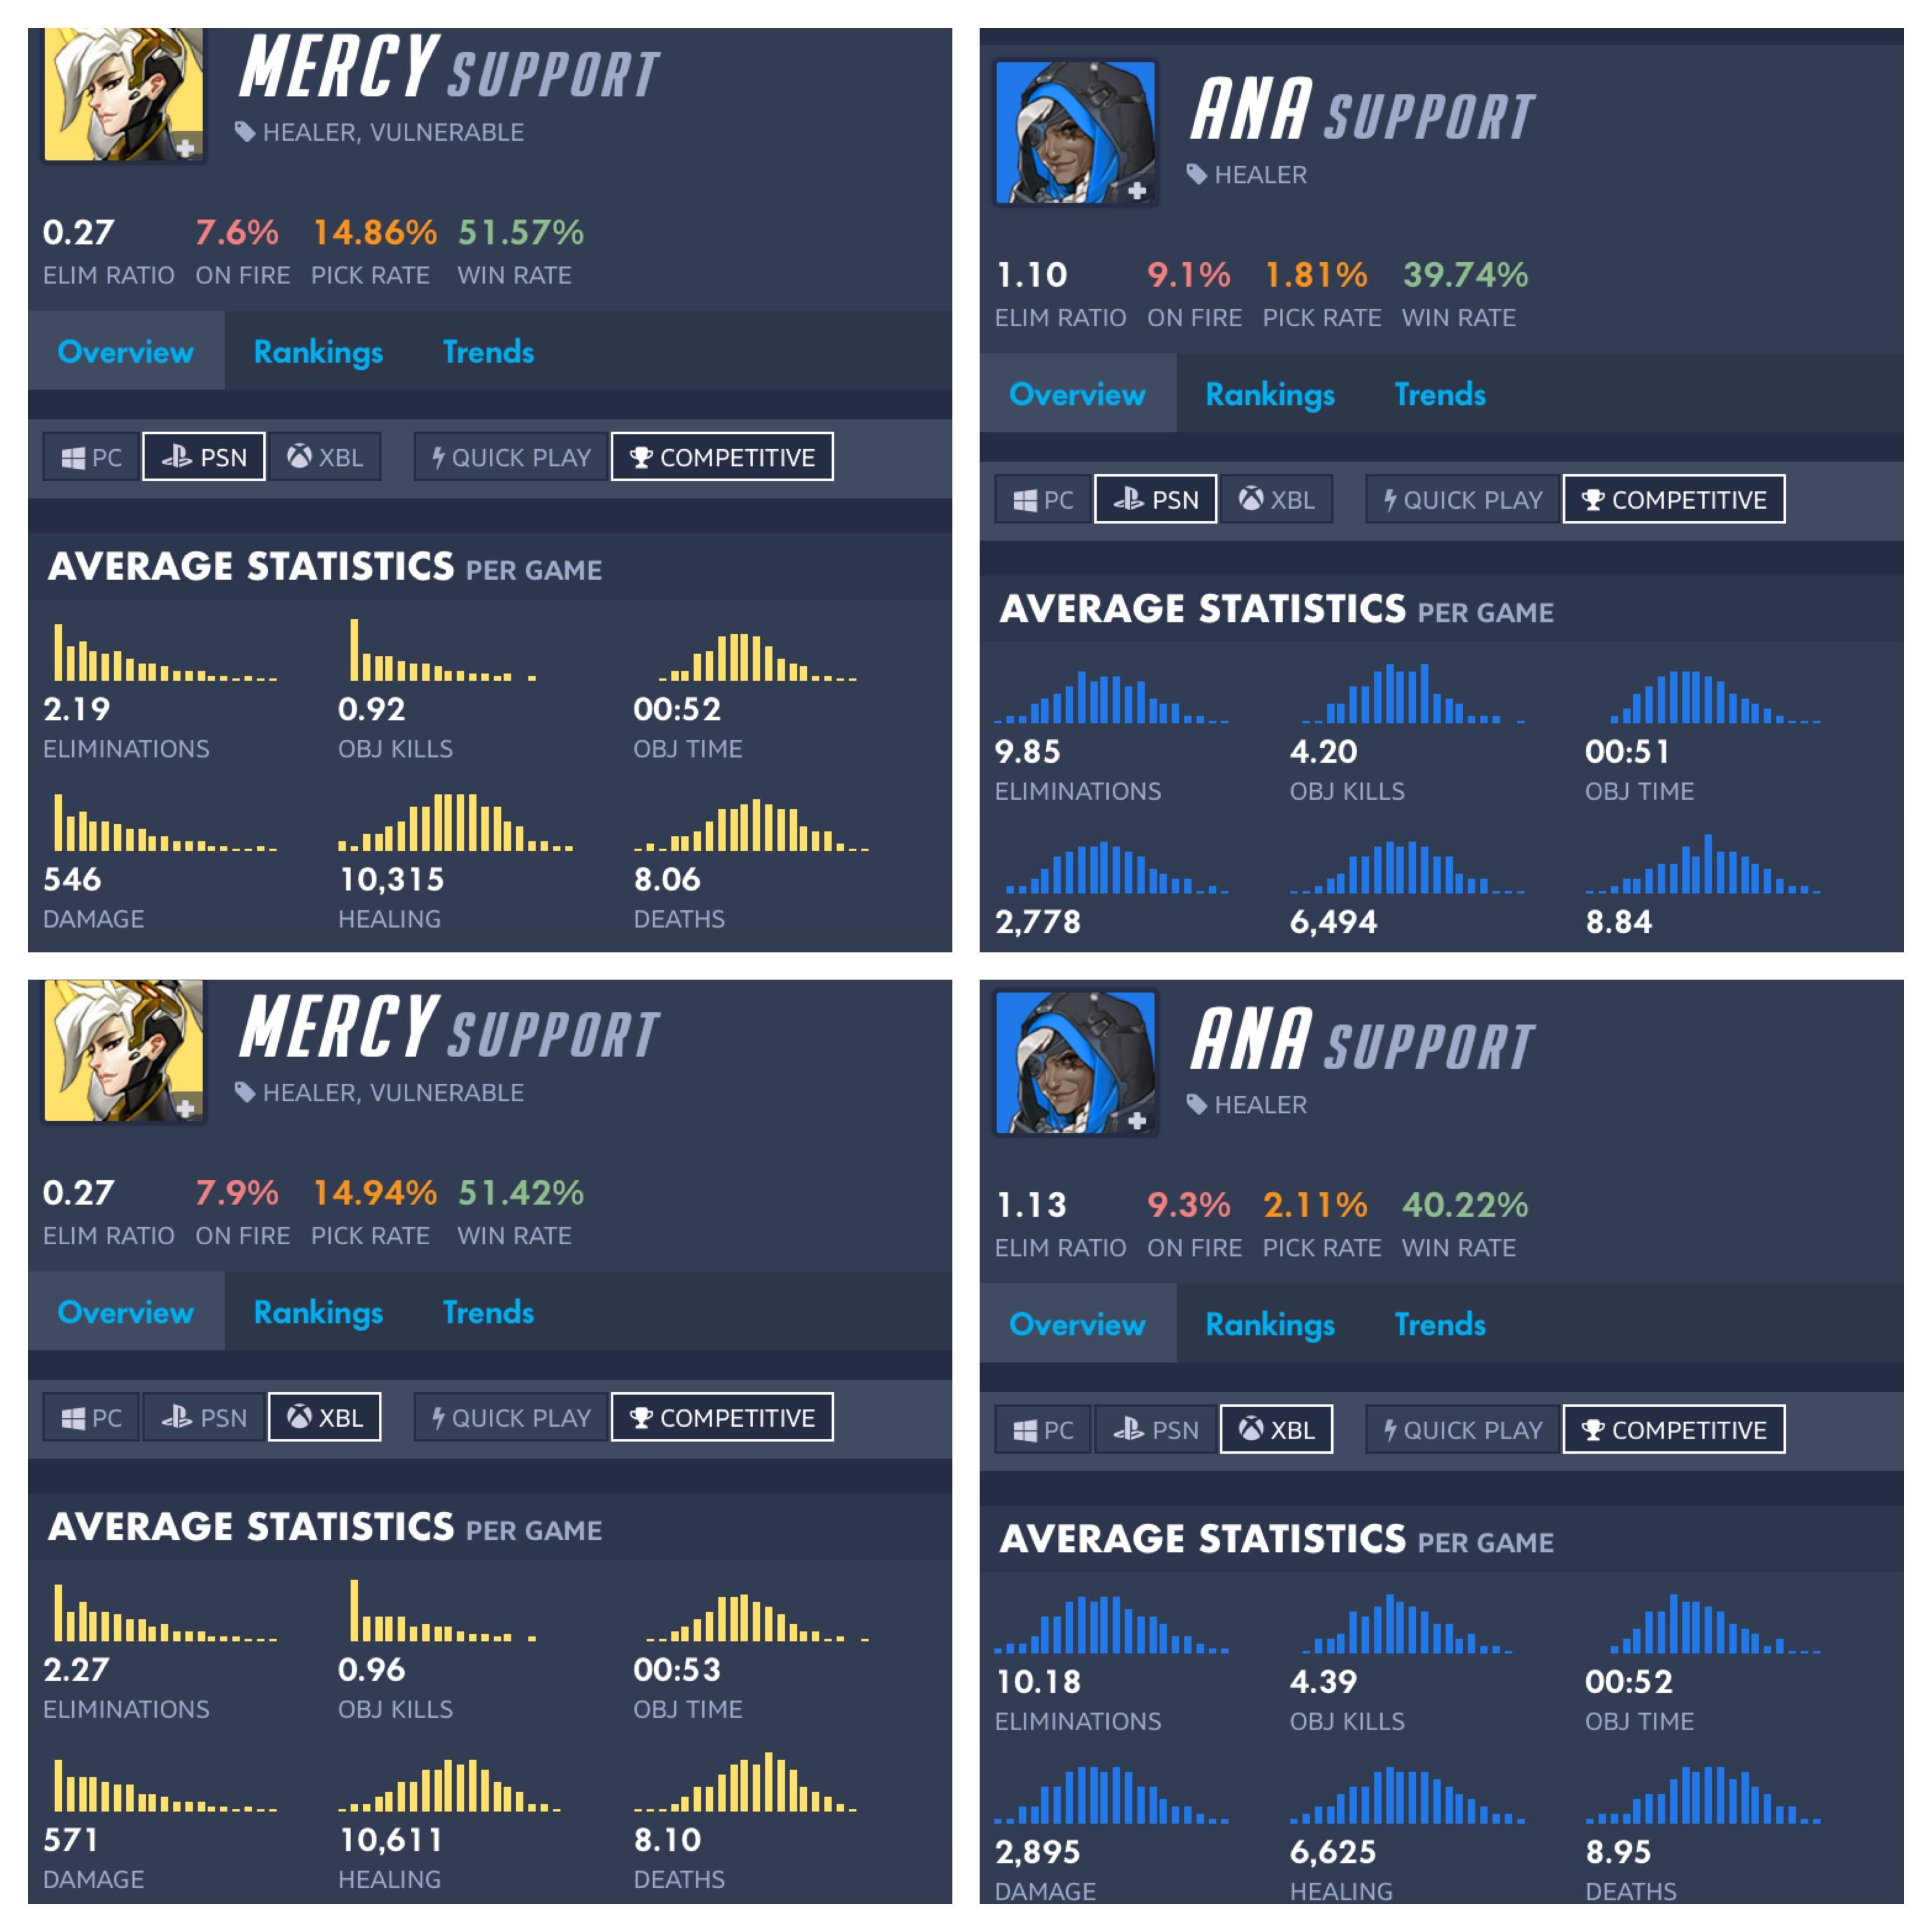 average mercy on console